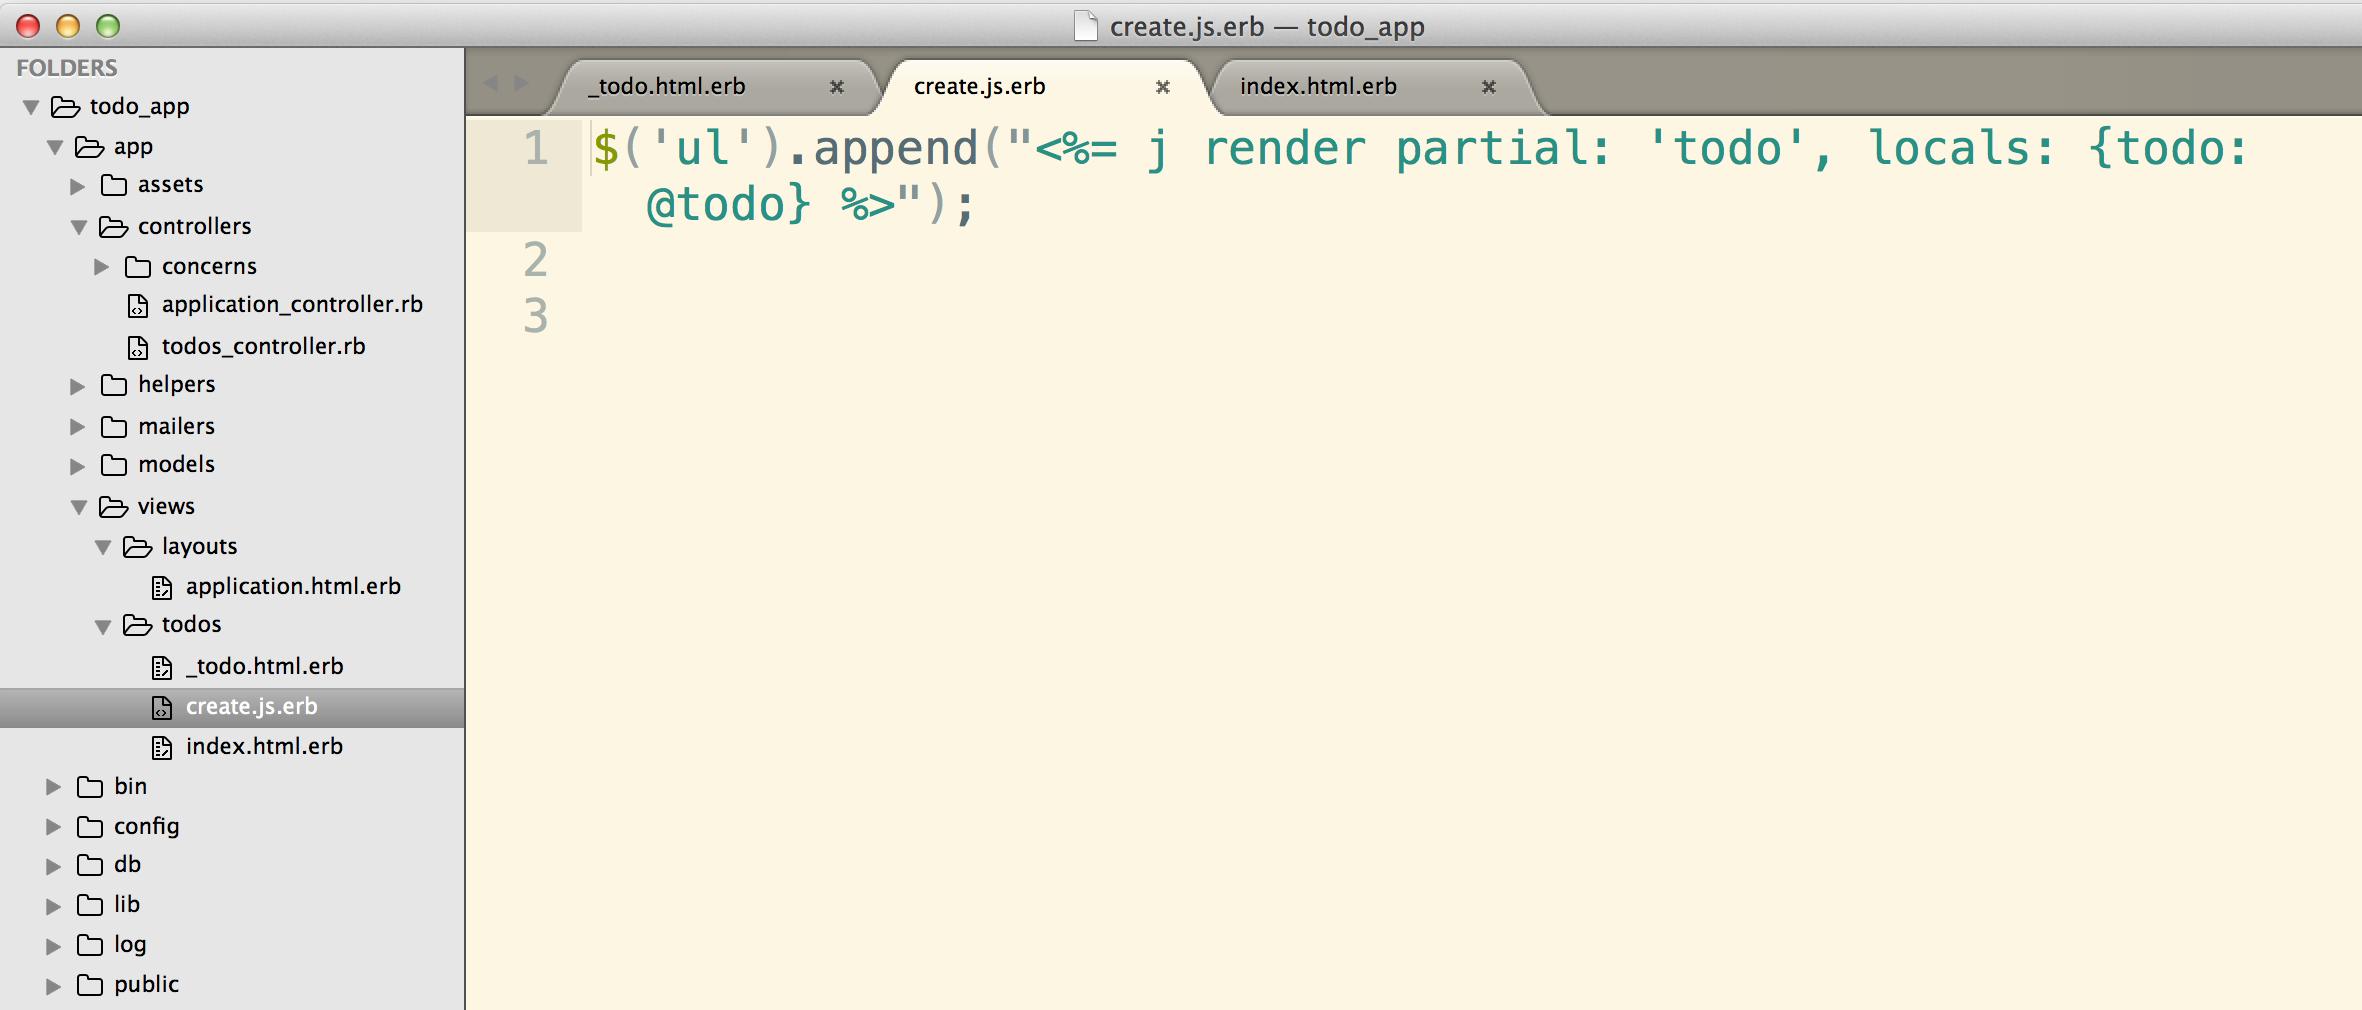 Integrating Ajax and Rails: A Simple Todo List App - code life